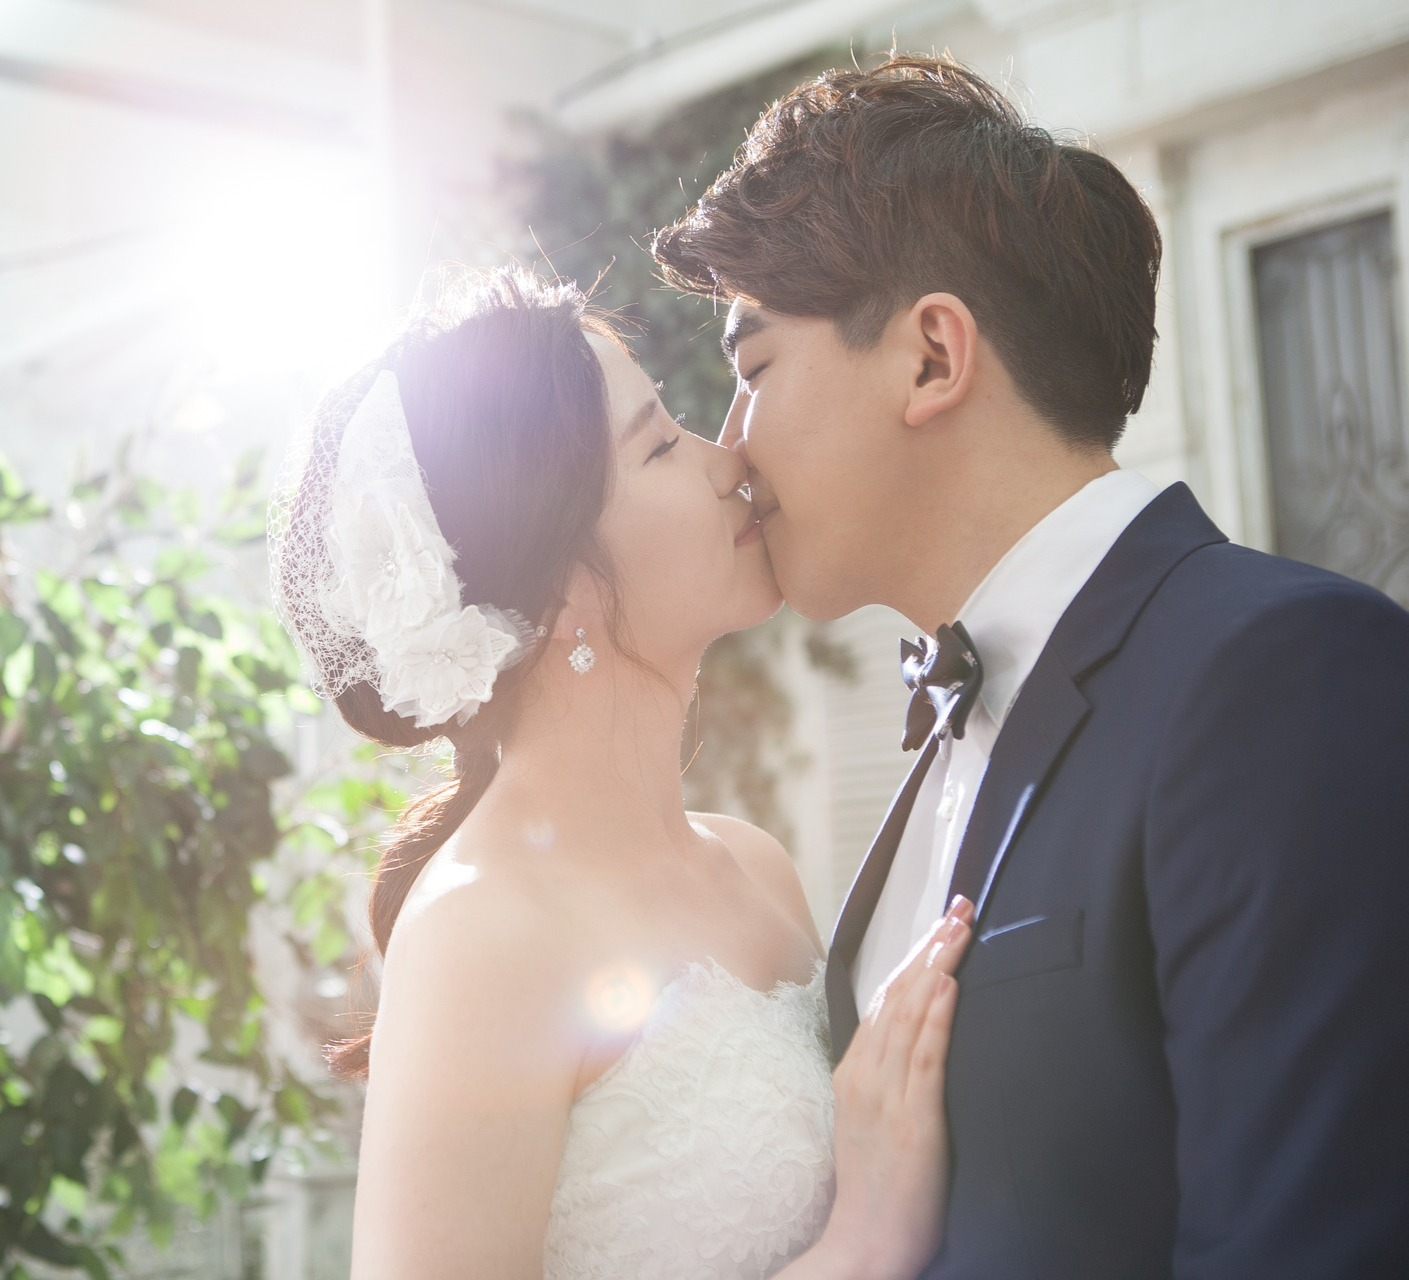 couple-2987453_1920_edited